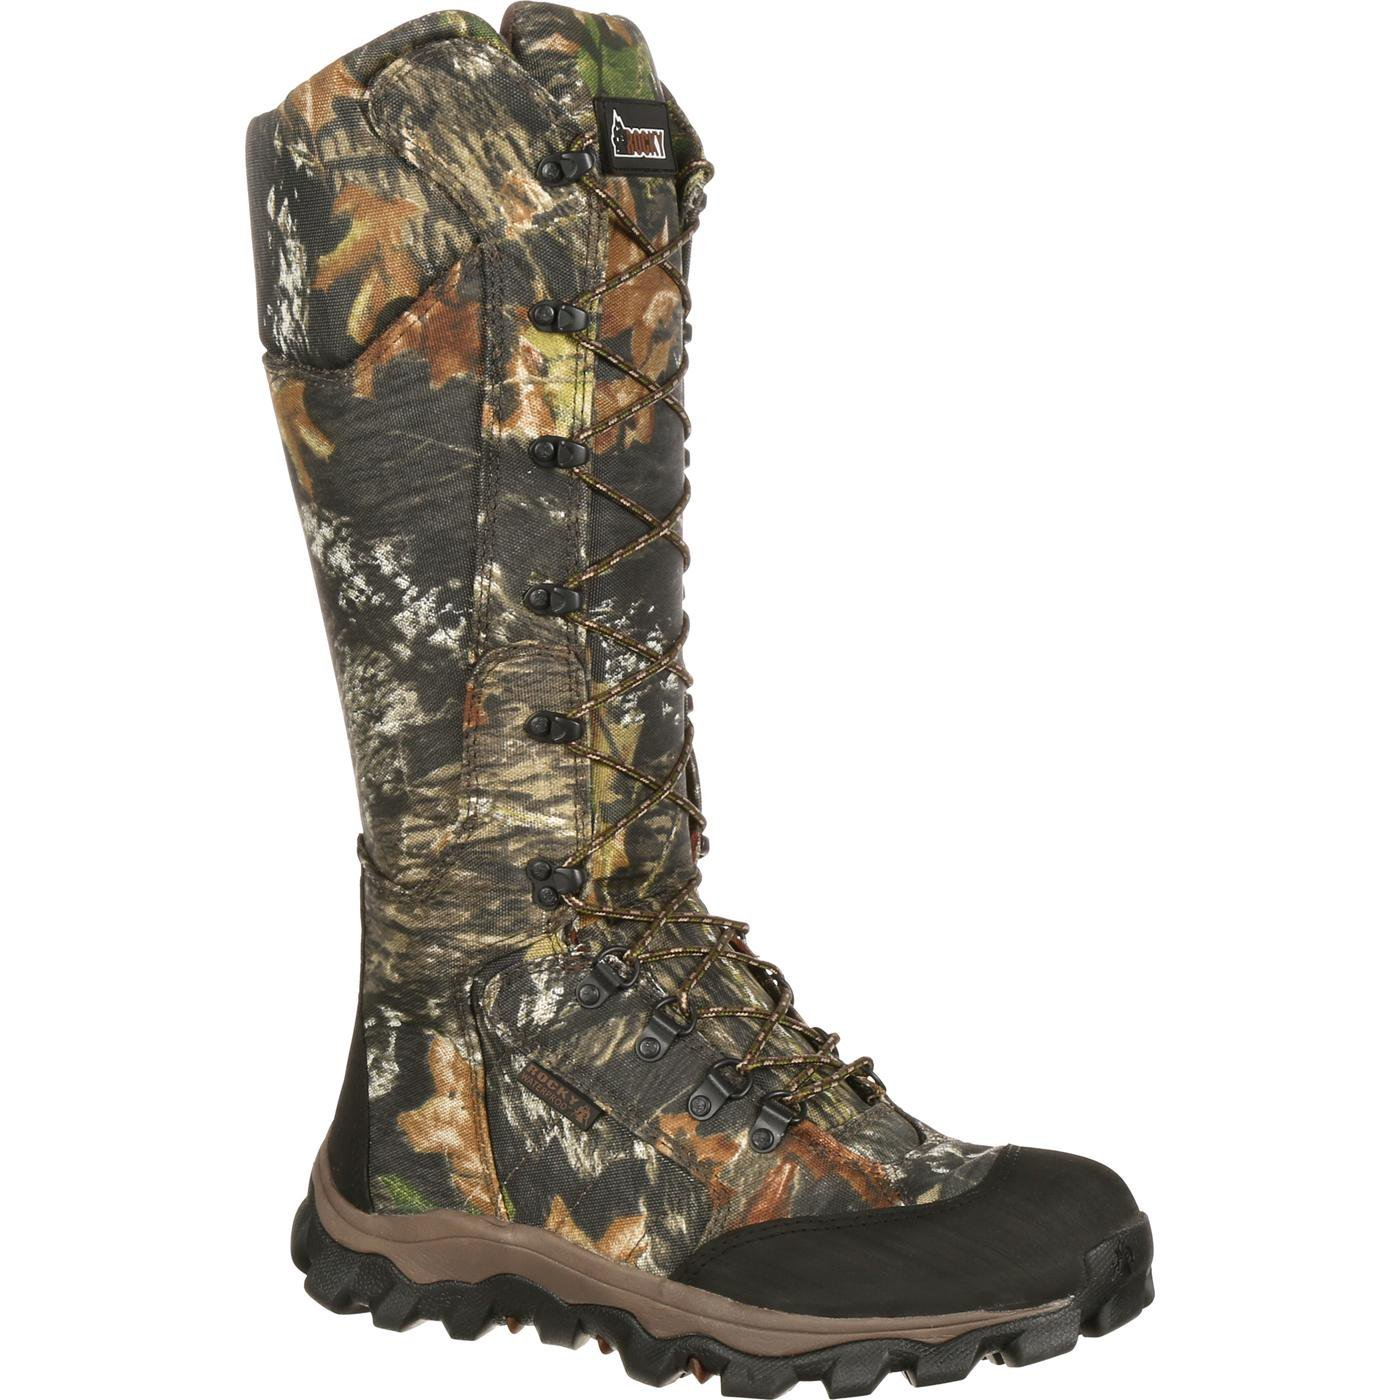 ROCKY Men's Lynx Snake Boot-M, Mobu, 11 W US by ROCKY